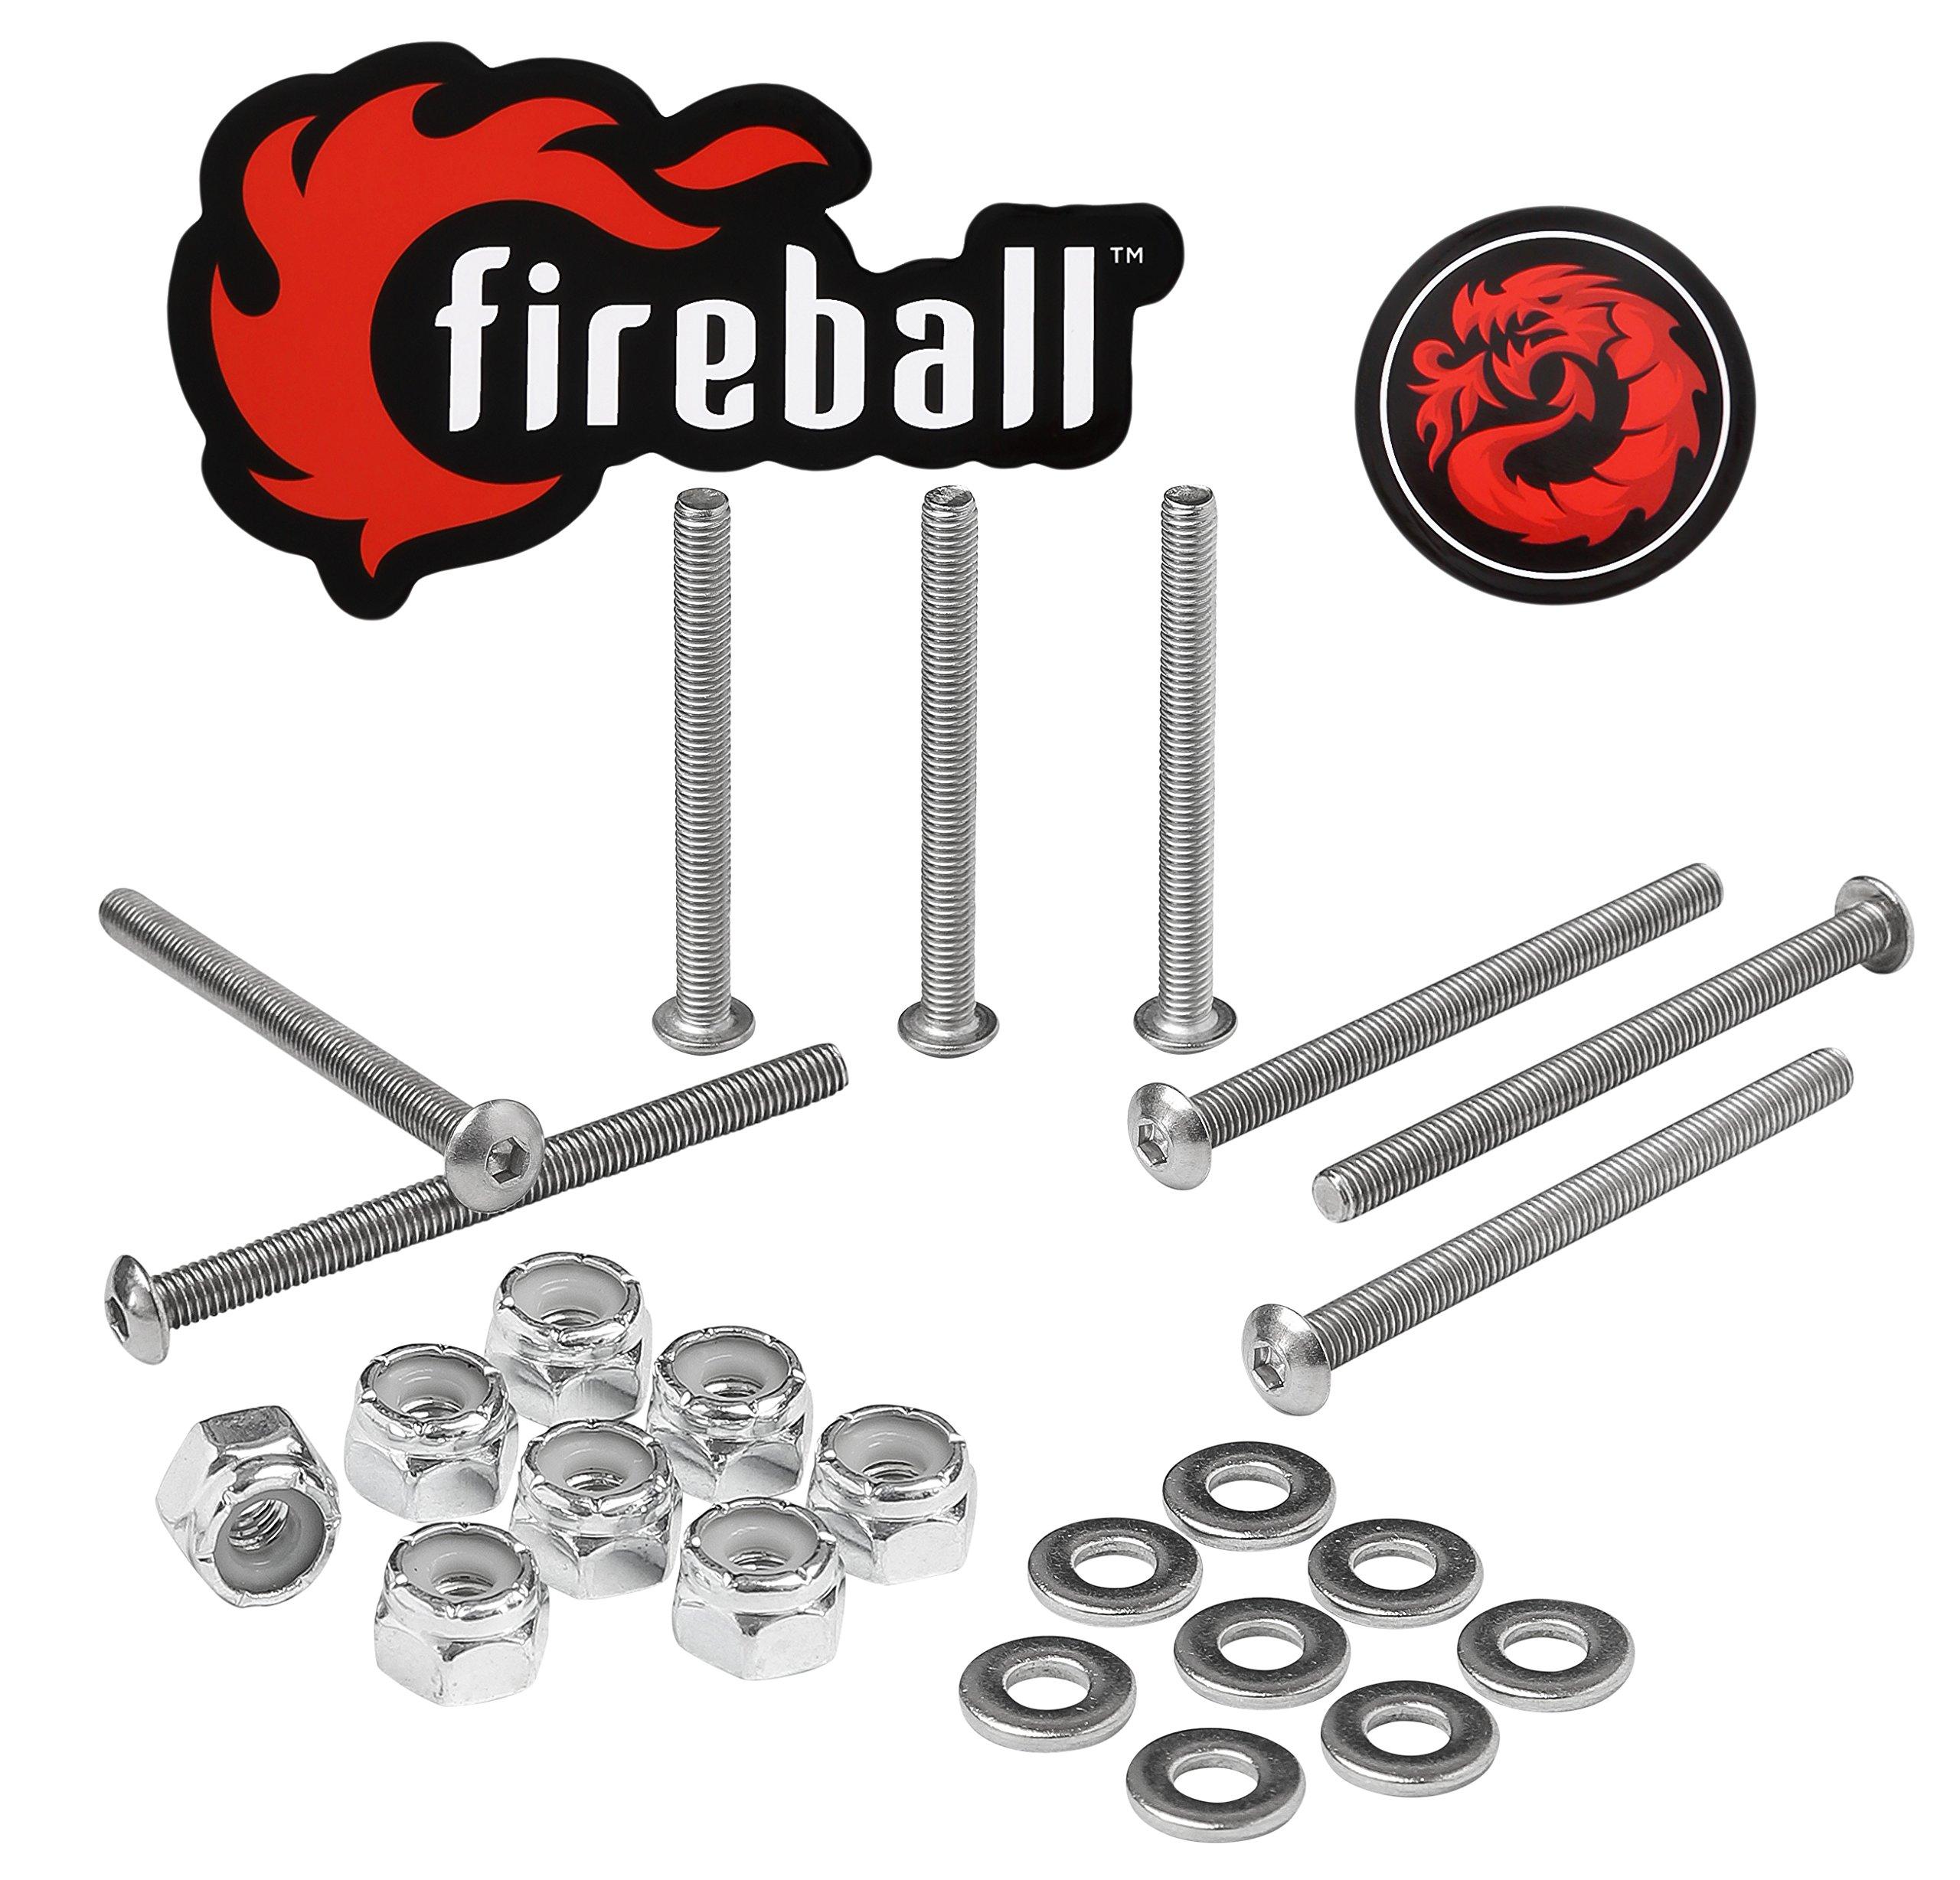 Fireball Dragon Stainless Steel Skateboard Hardware Set (Button Allen, 2.5'') by Fireball (Image #1)